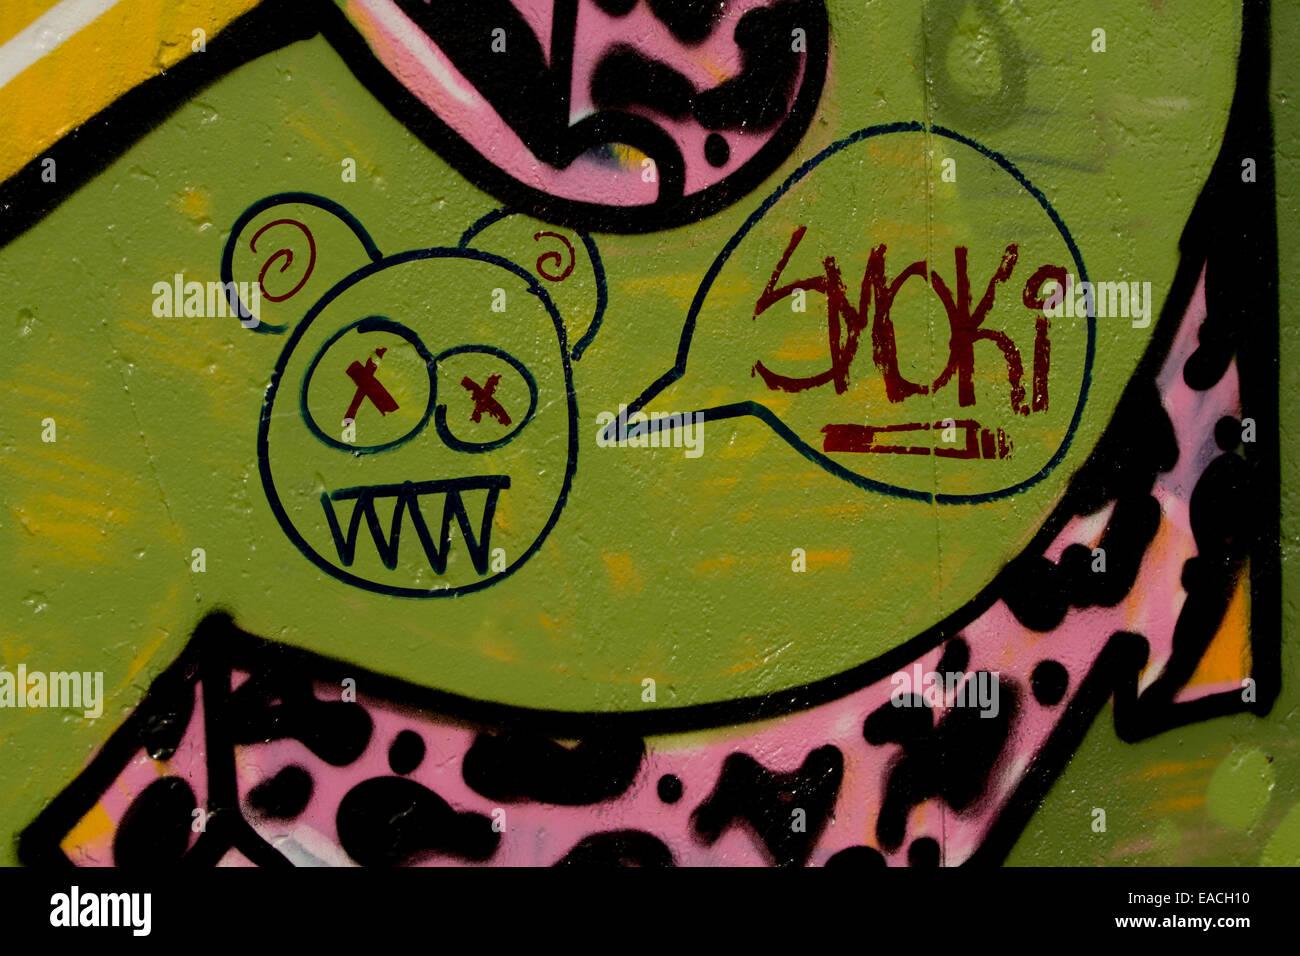 Graffiti cartoon face smoki joint colourful wall - Stock Image